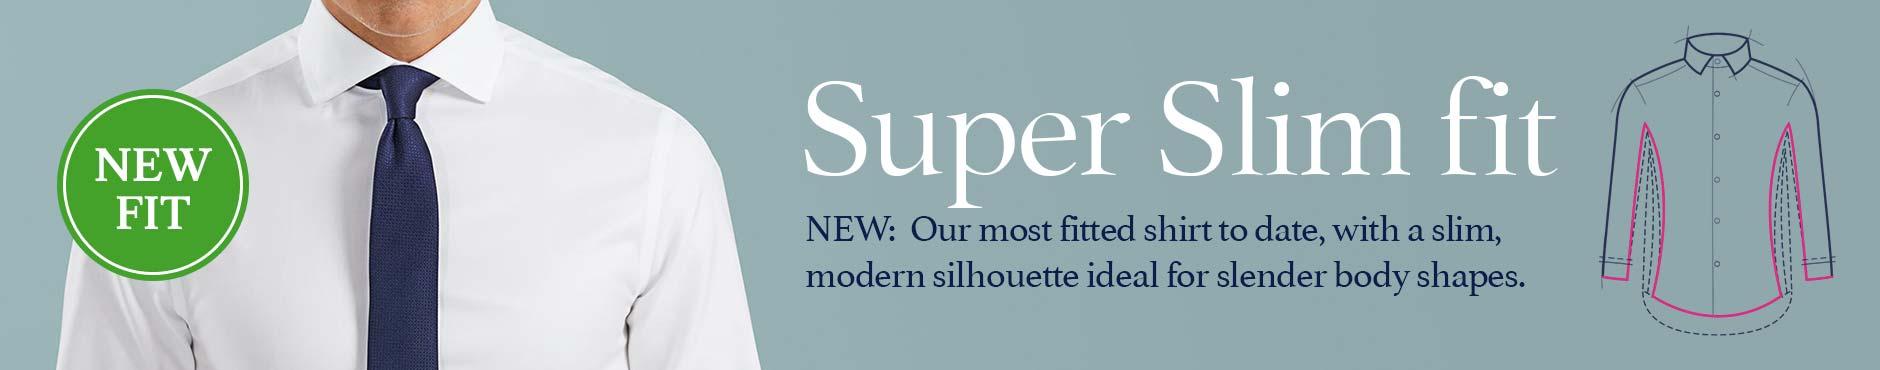 TIB-Superslim-fit-shirts.jpg